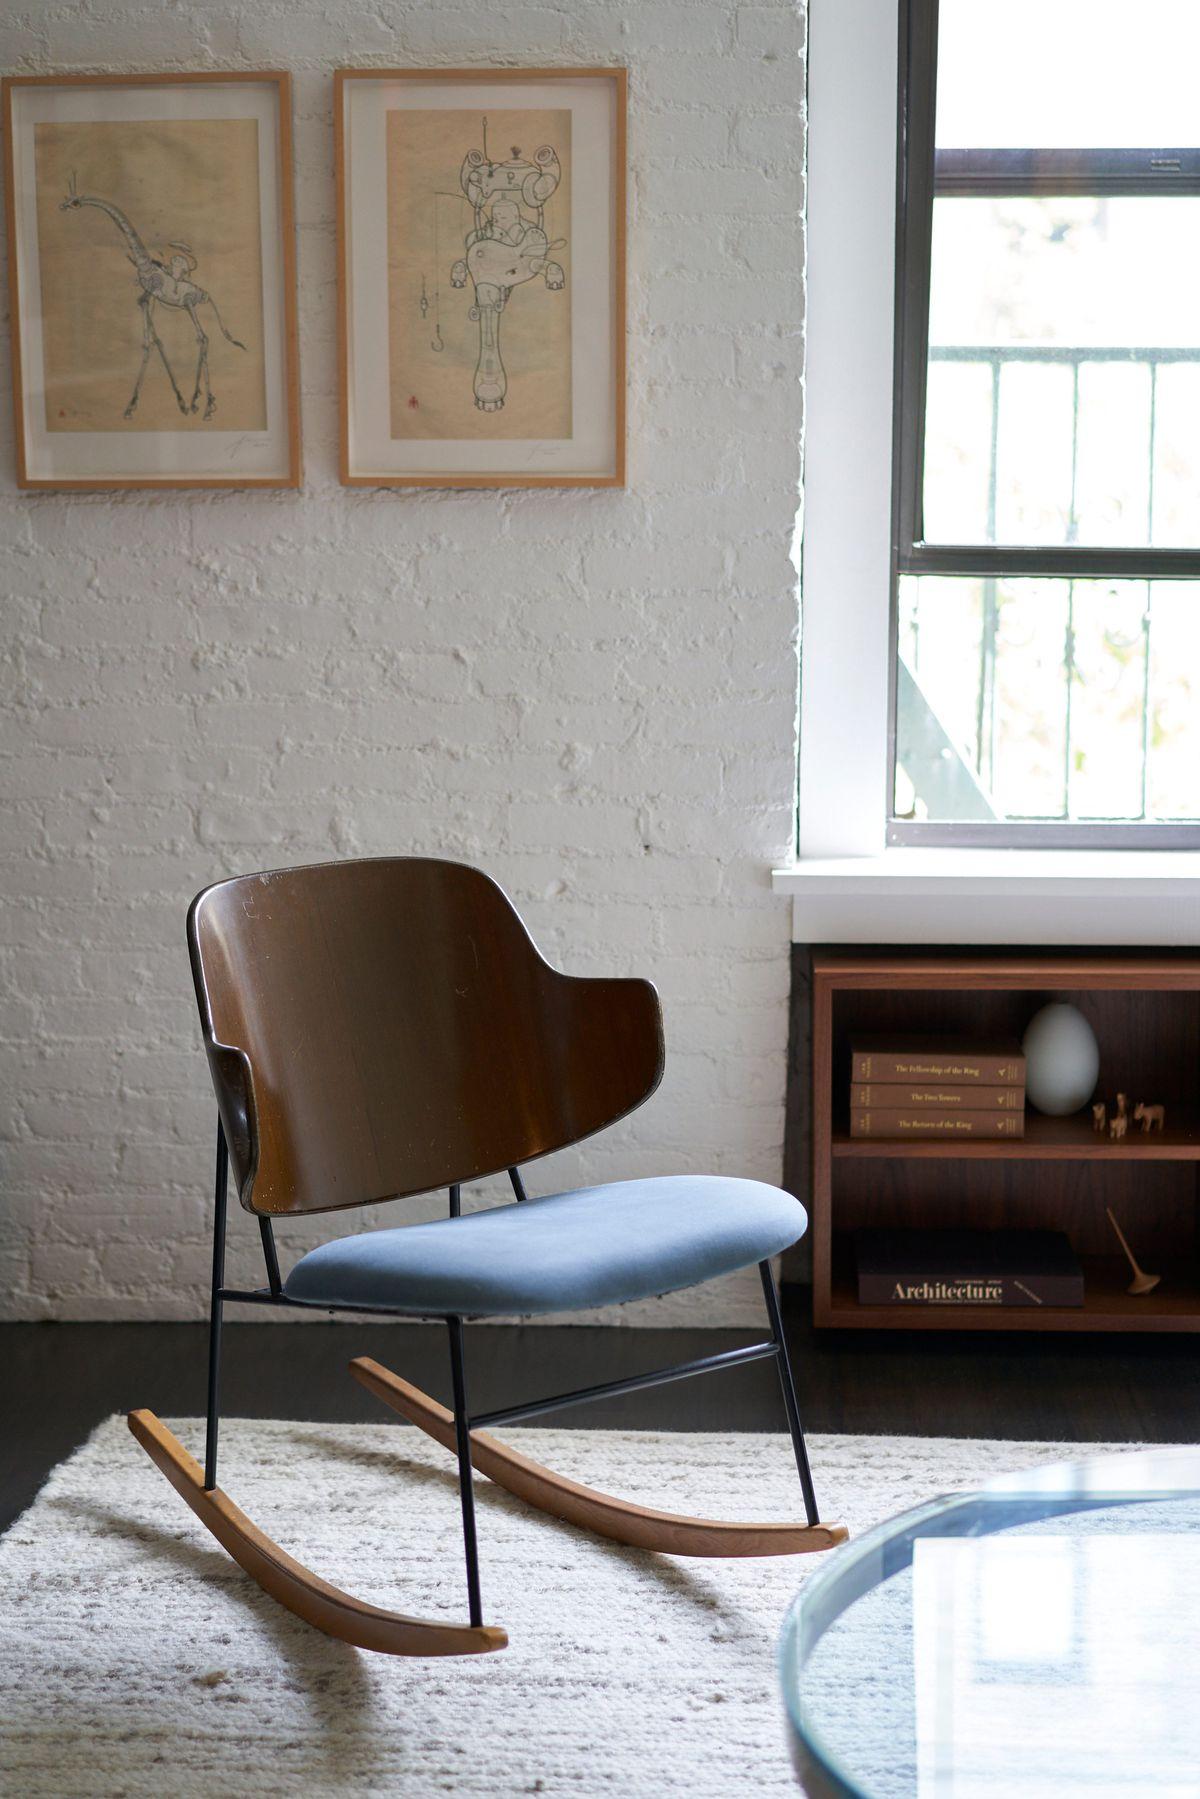 A rocking chair near a window.